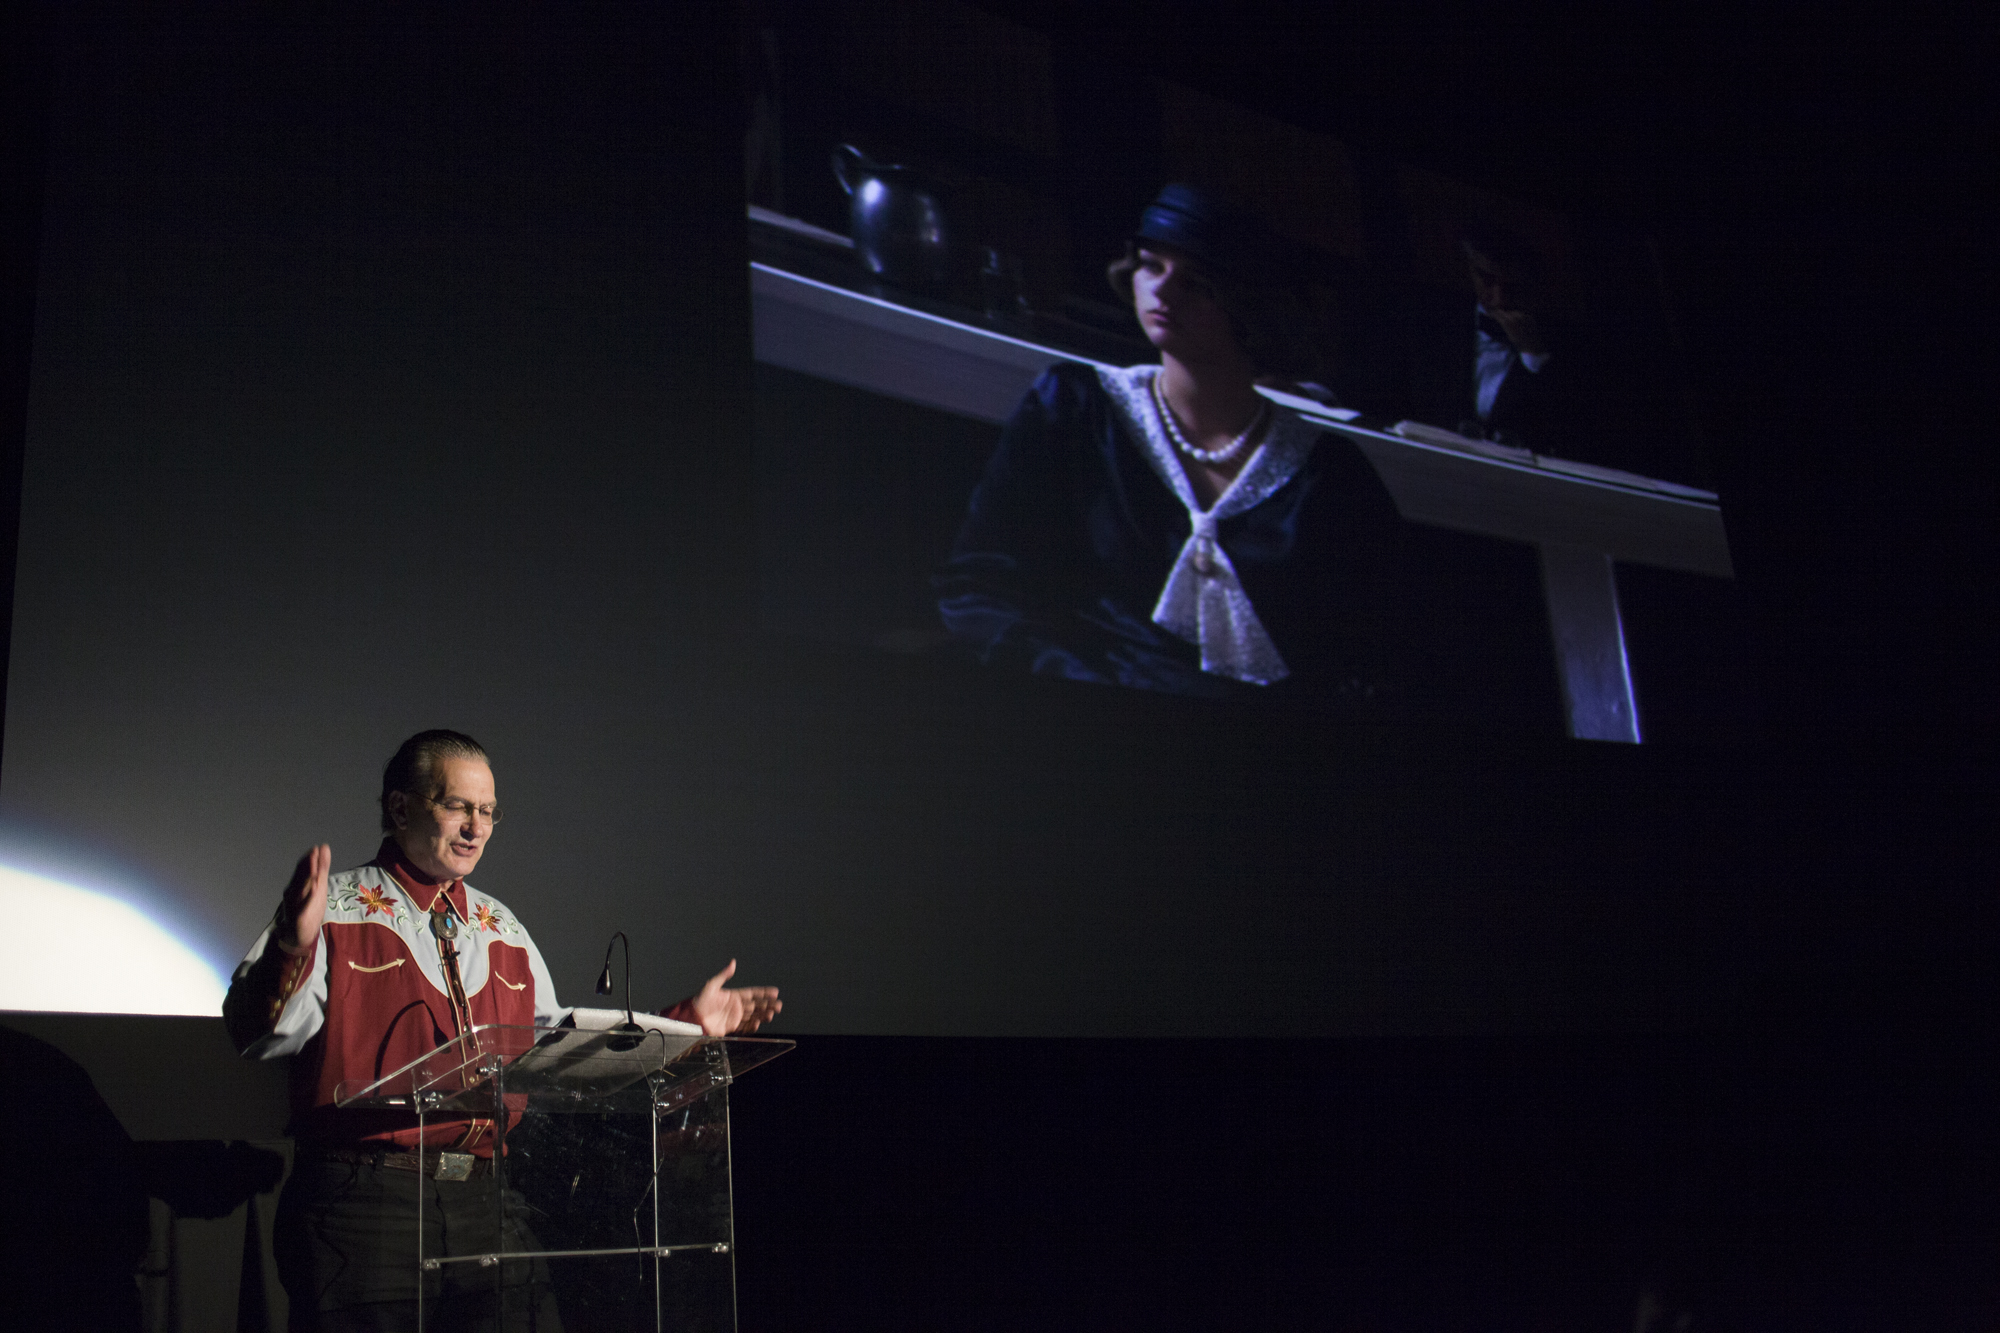 Joe Bob Briggs lecturing at the Chattanooga Film Festival. (Photo: David Andrews)